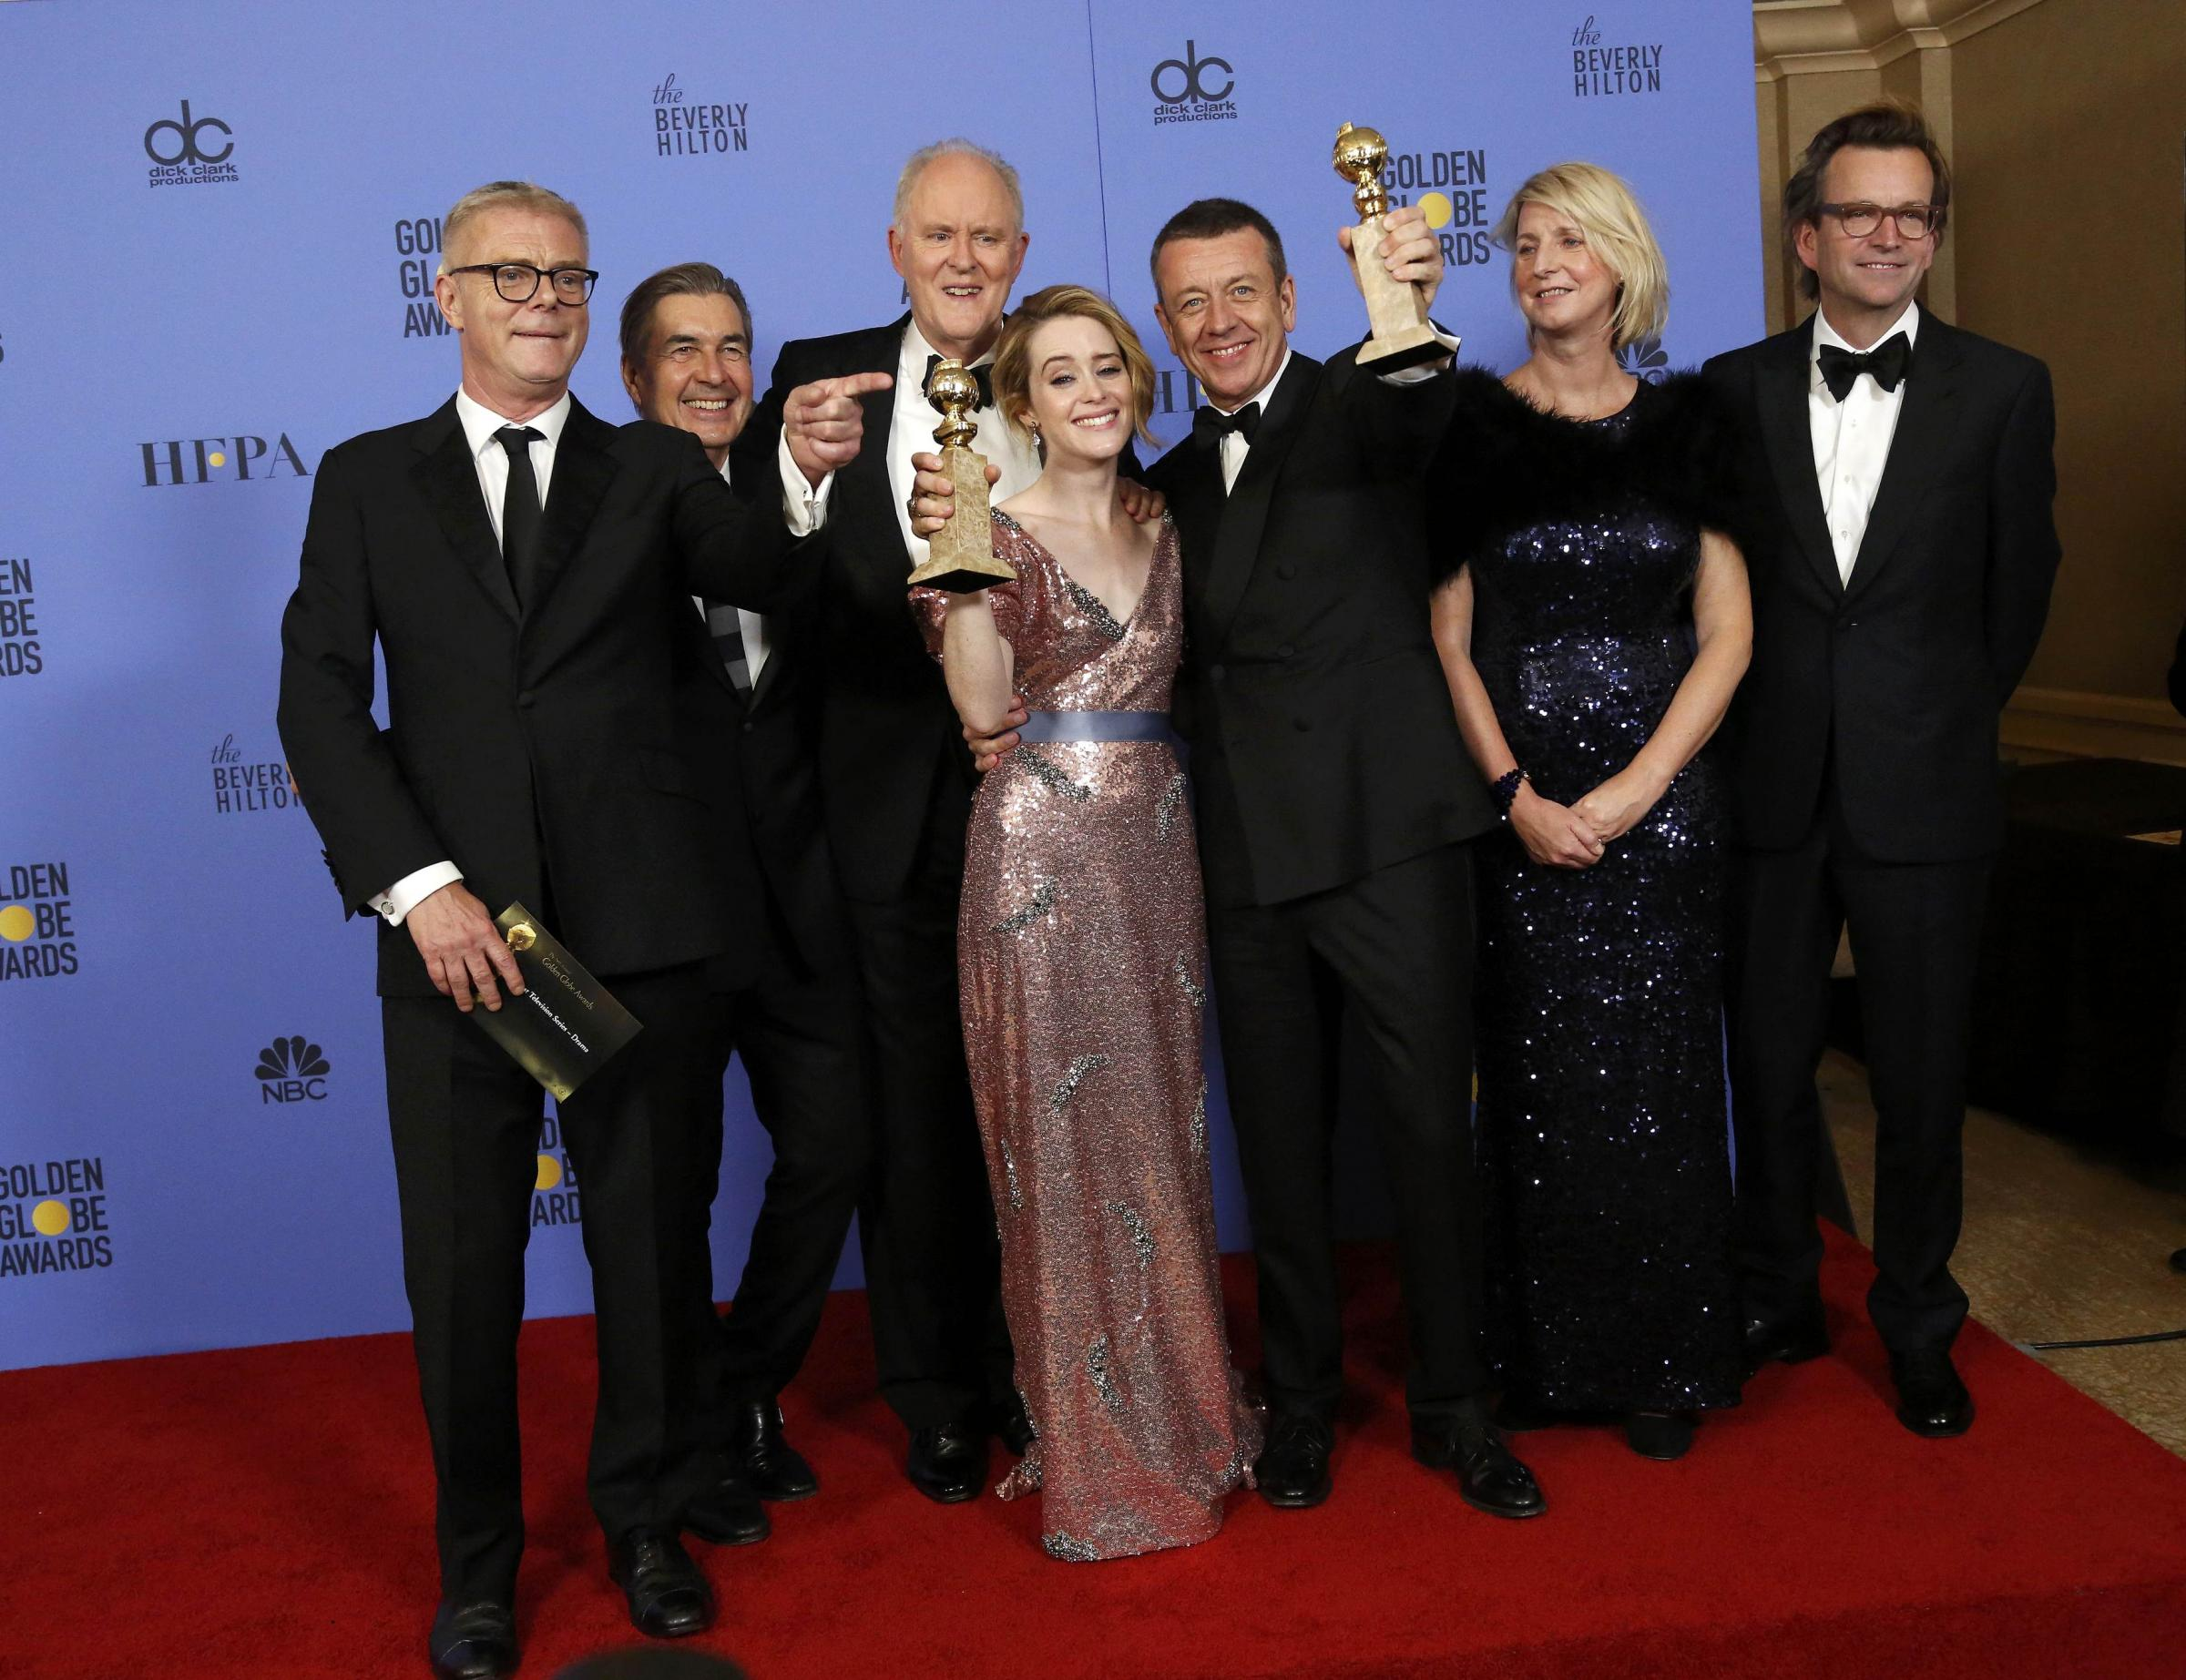 Golden Globes 2017, vincitori: tra le serie tv trionfa The Crown